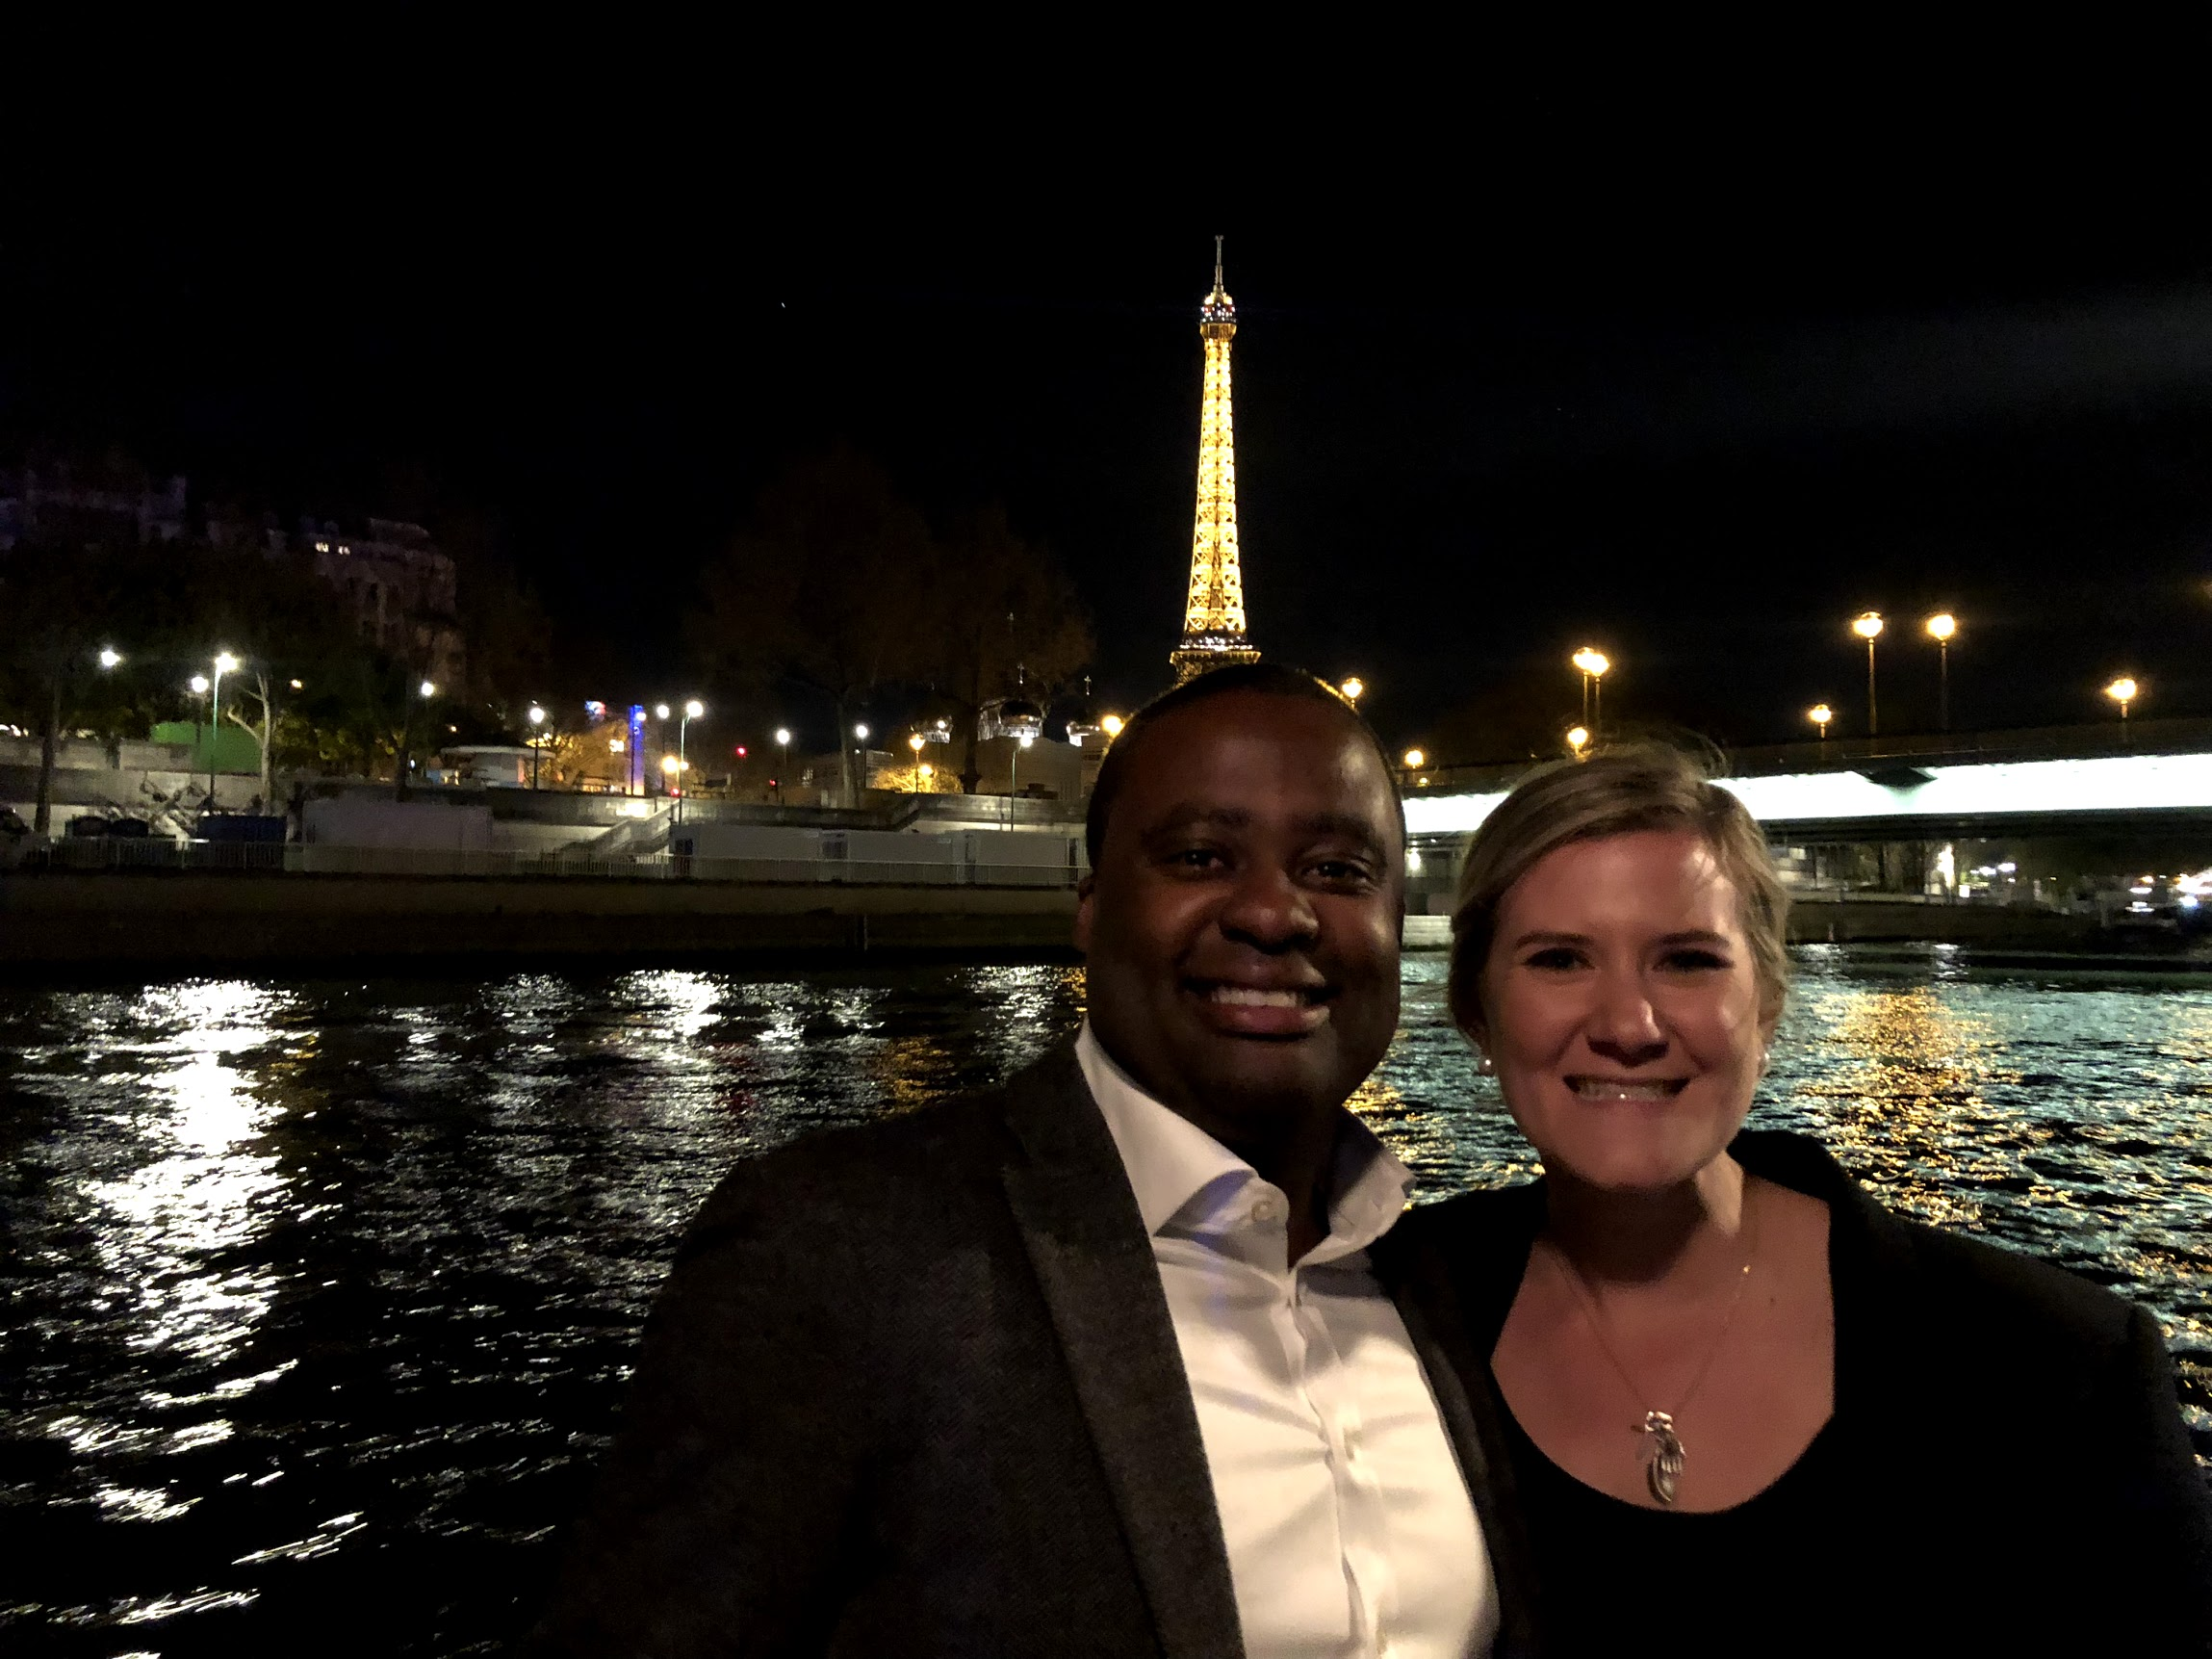 Graduate Business Forum's 36th annual Graduate Business Conference (GBC) in Paris, France